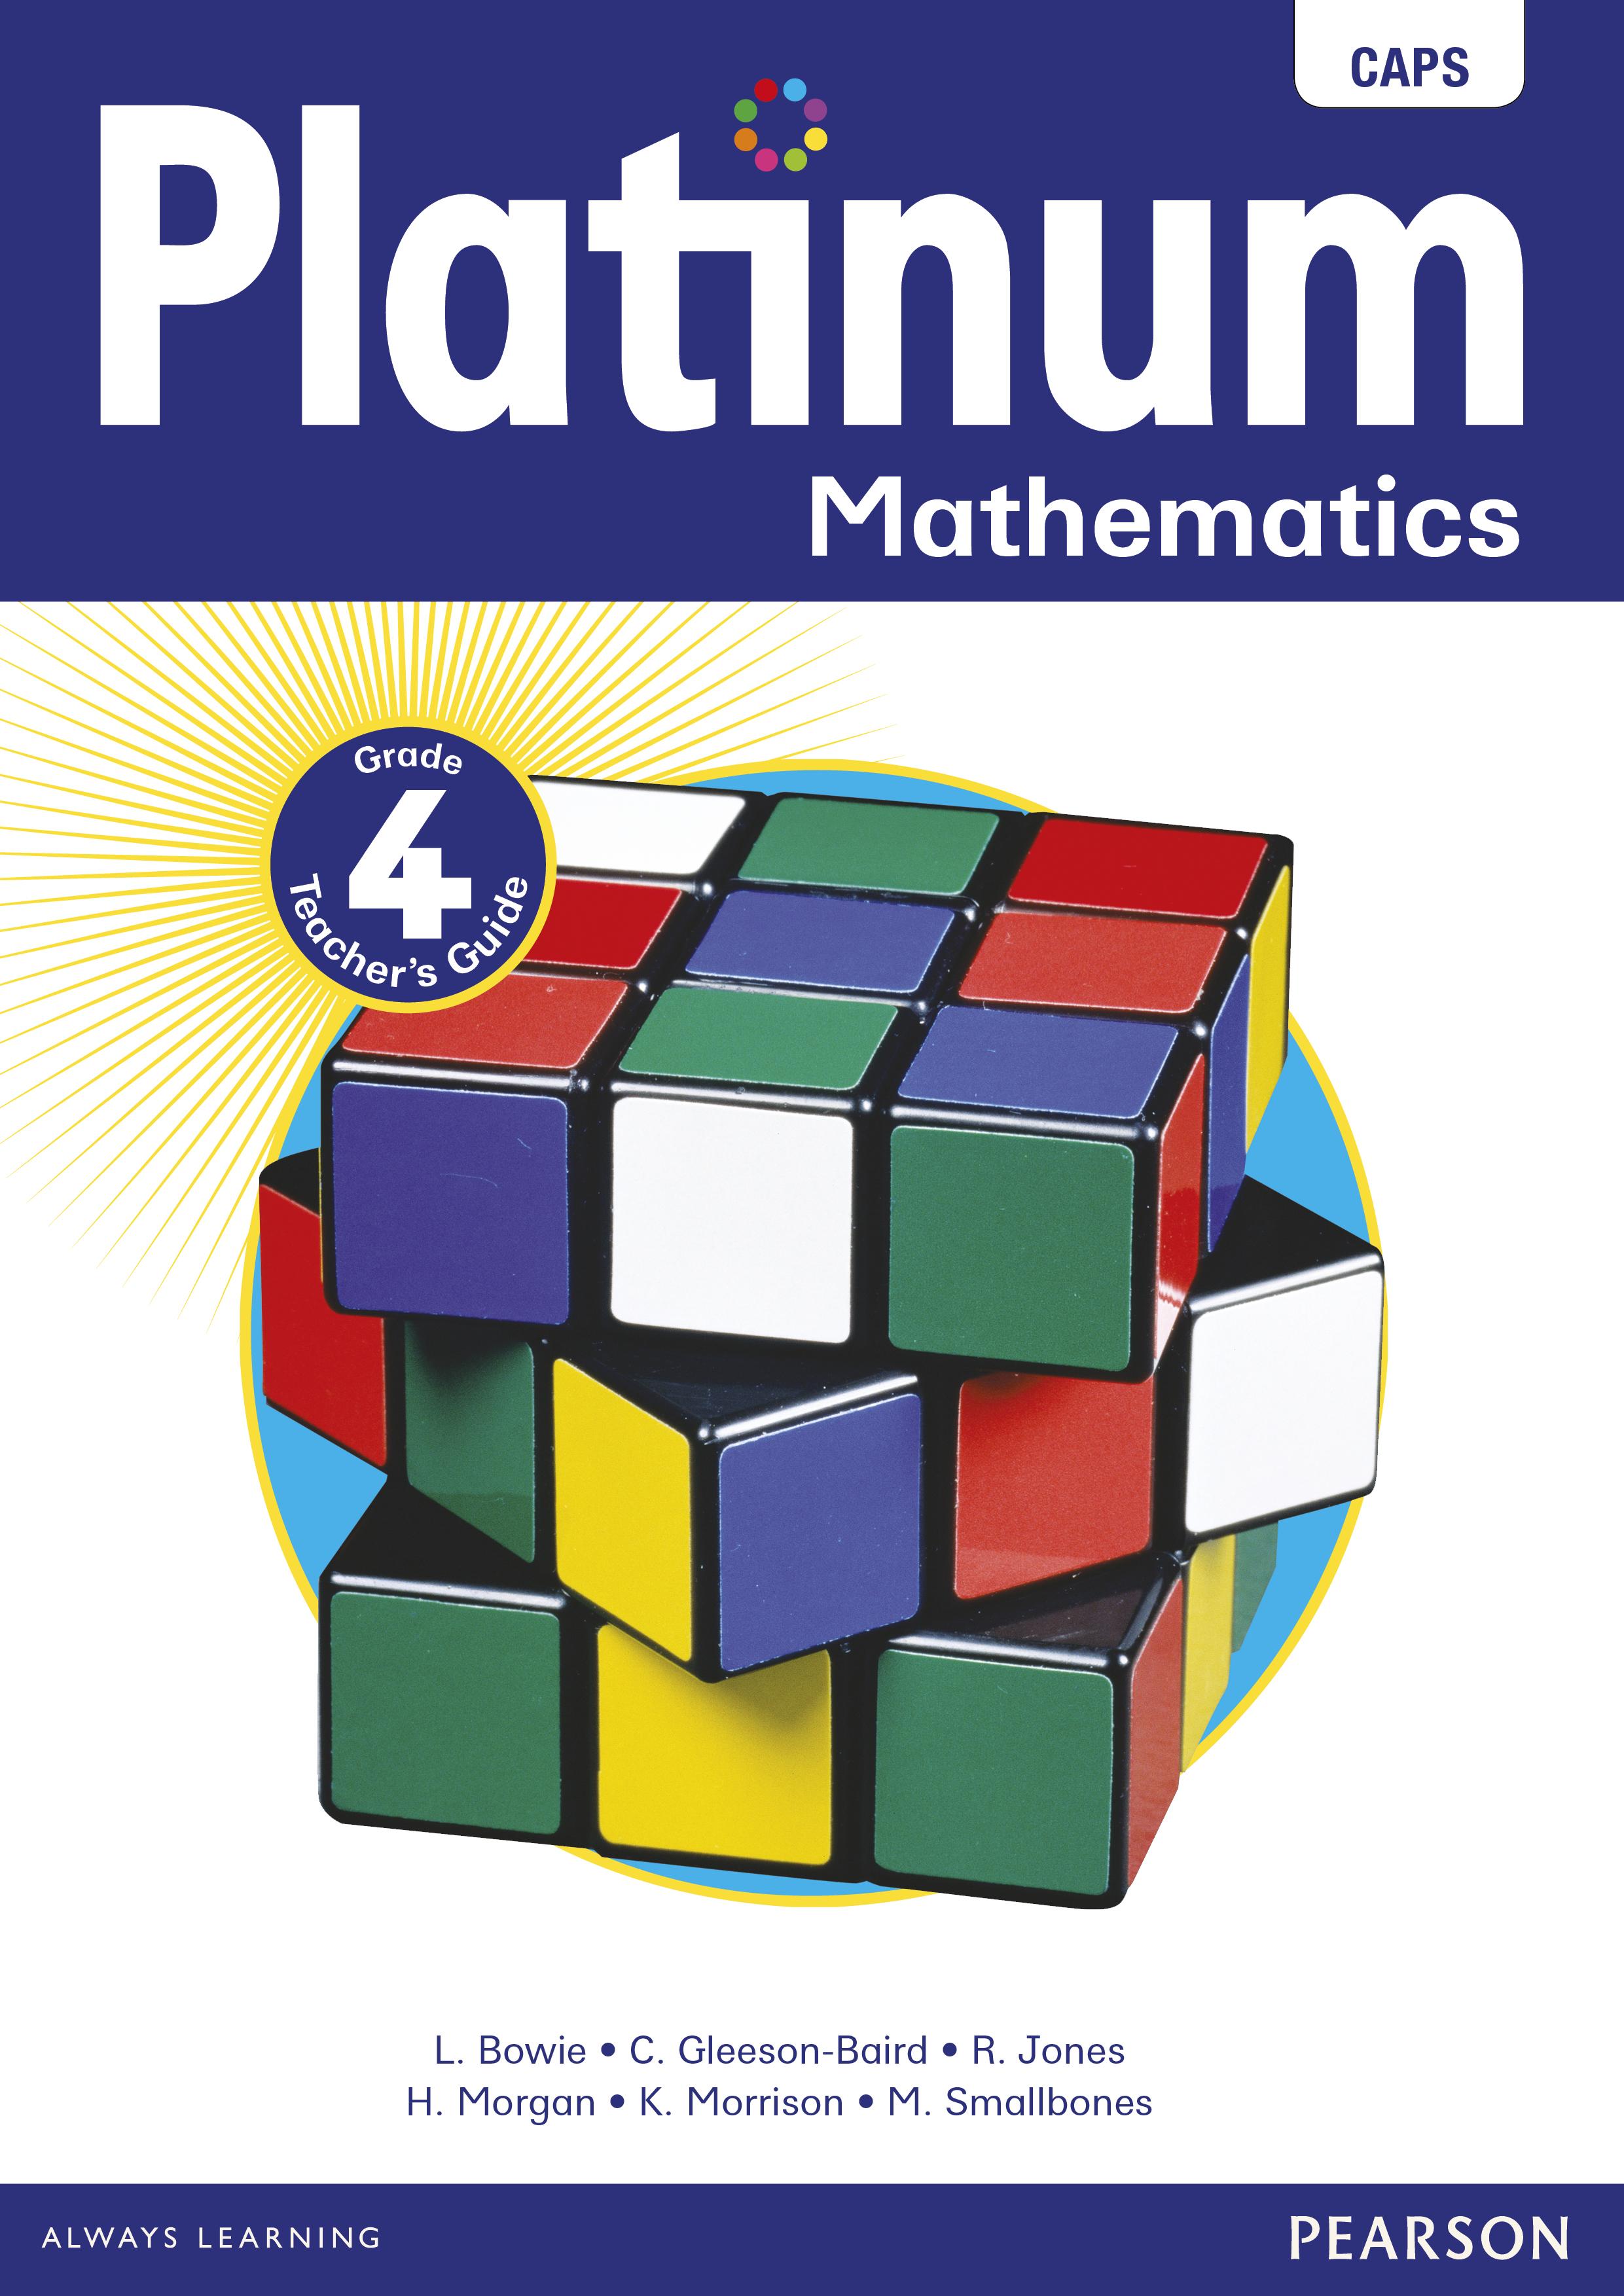 Platinum Mathematics Grade 4 Teacher's Guide ePDF (perpetual licence)